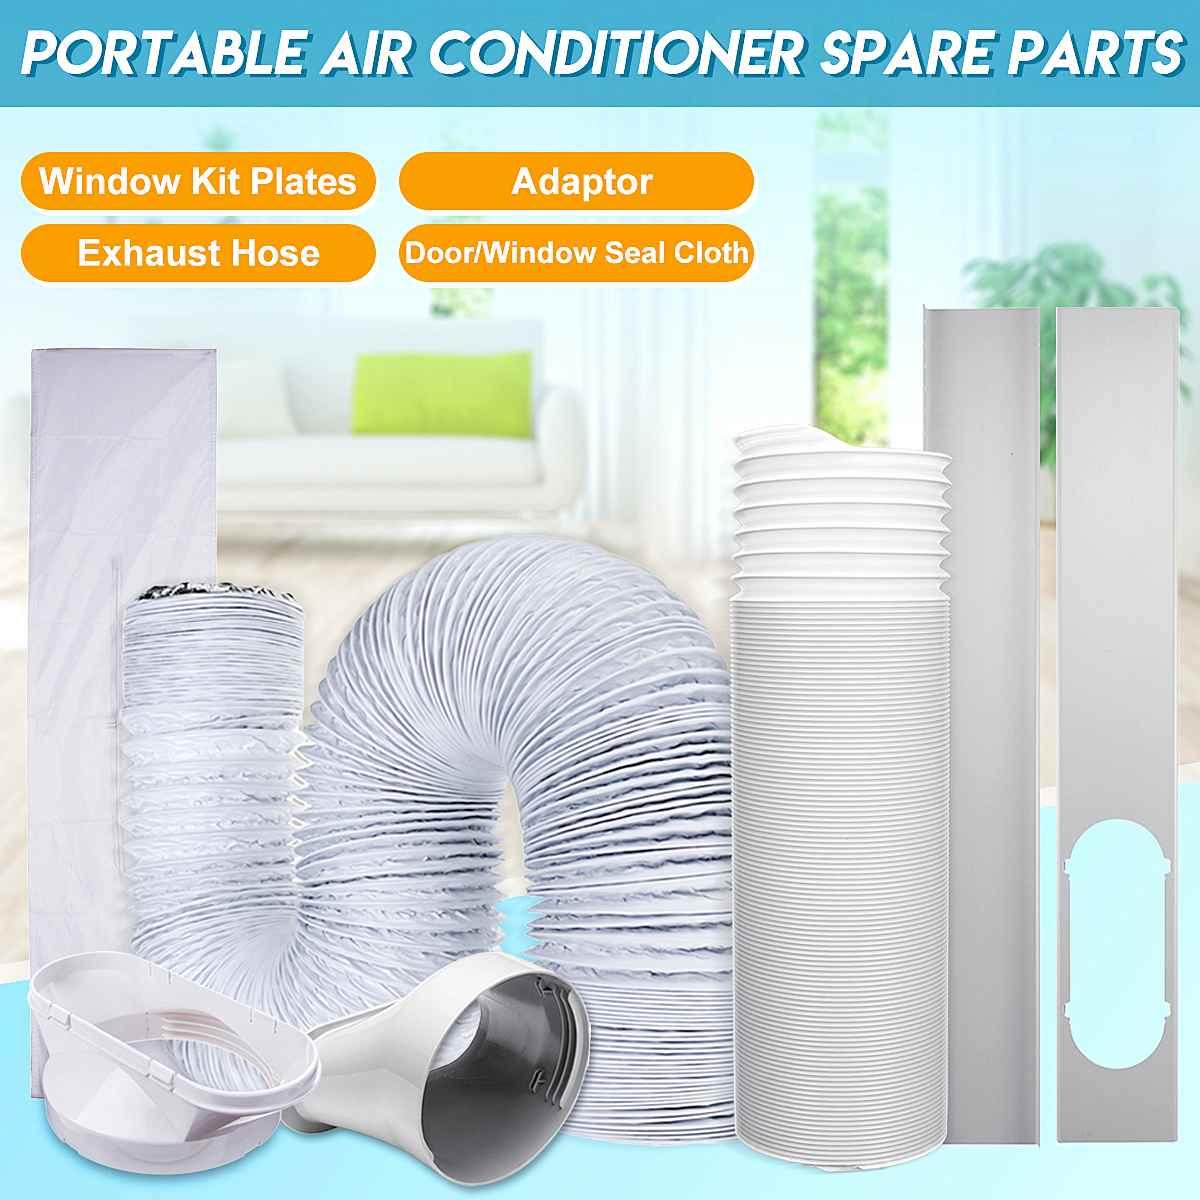 Portable Air Conditioner Accessories Window Plate Door/Window Seal Cloth Adaptor Exhaust Hose Tube Air Conditioner Spare Parts